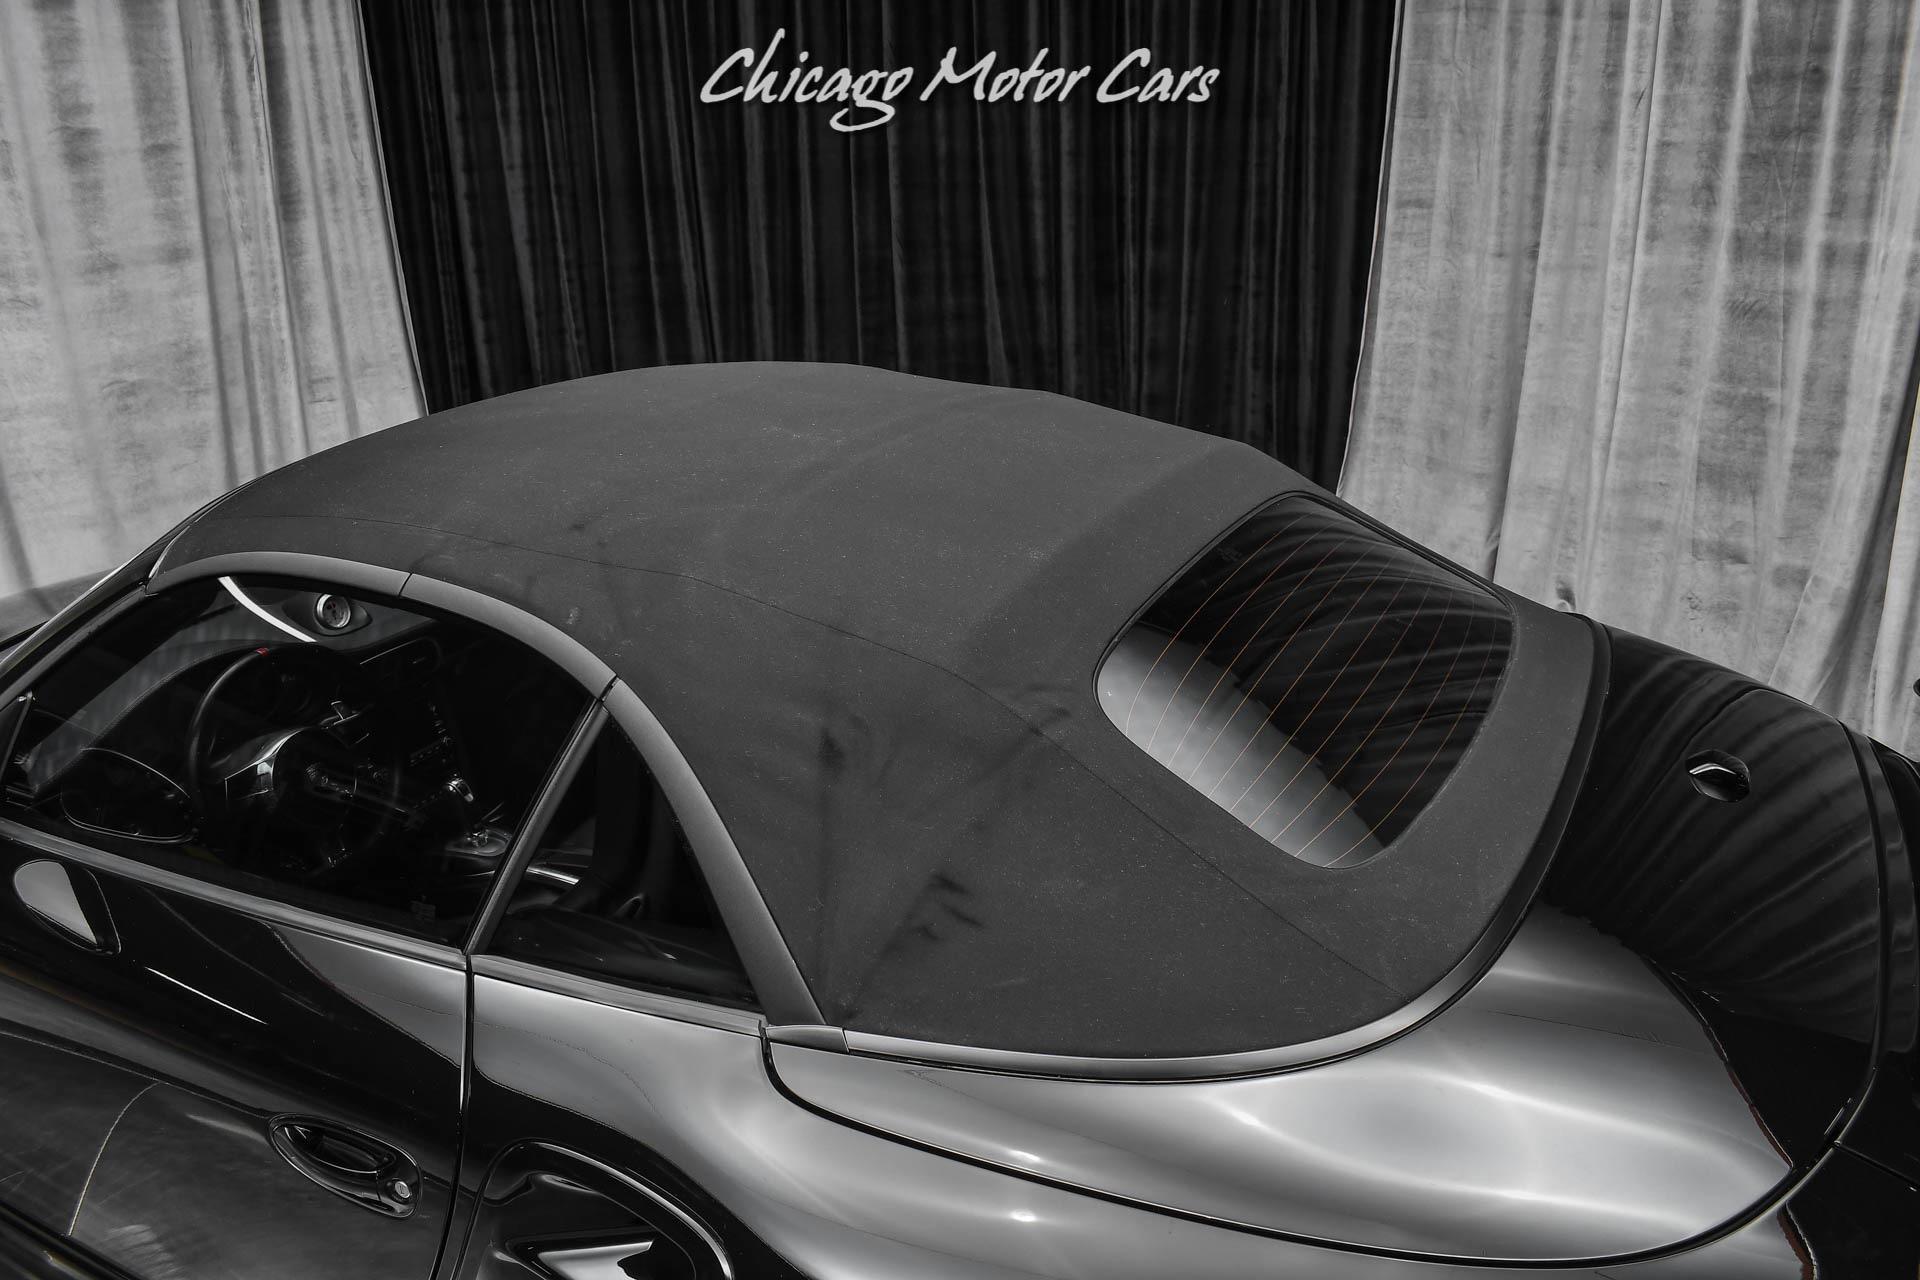 Used-2011-Porsche-911-AWD-Turbo-2dr-Cabriolet-Turbo-Carbon-Fiber-Diffuser-Carbon-Ceramic-Brakes-HRE-Wheels